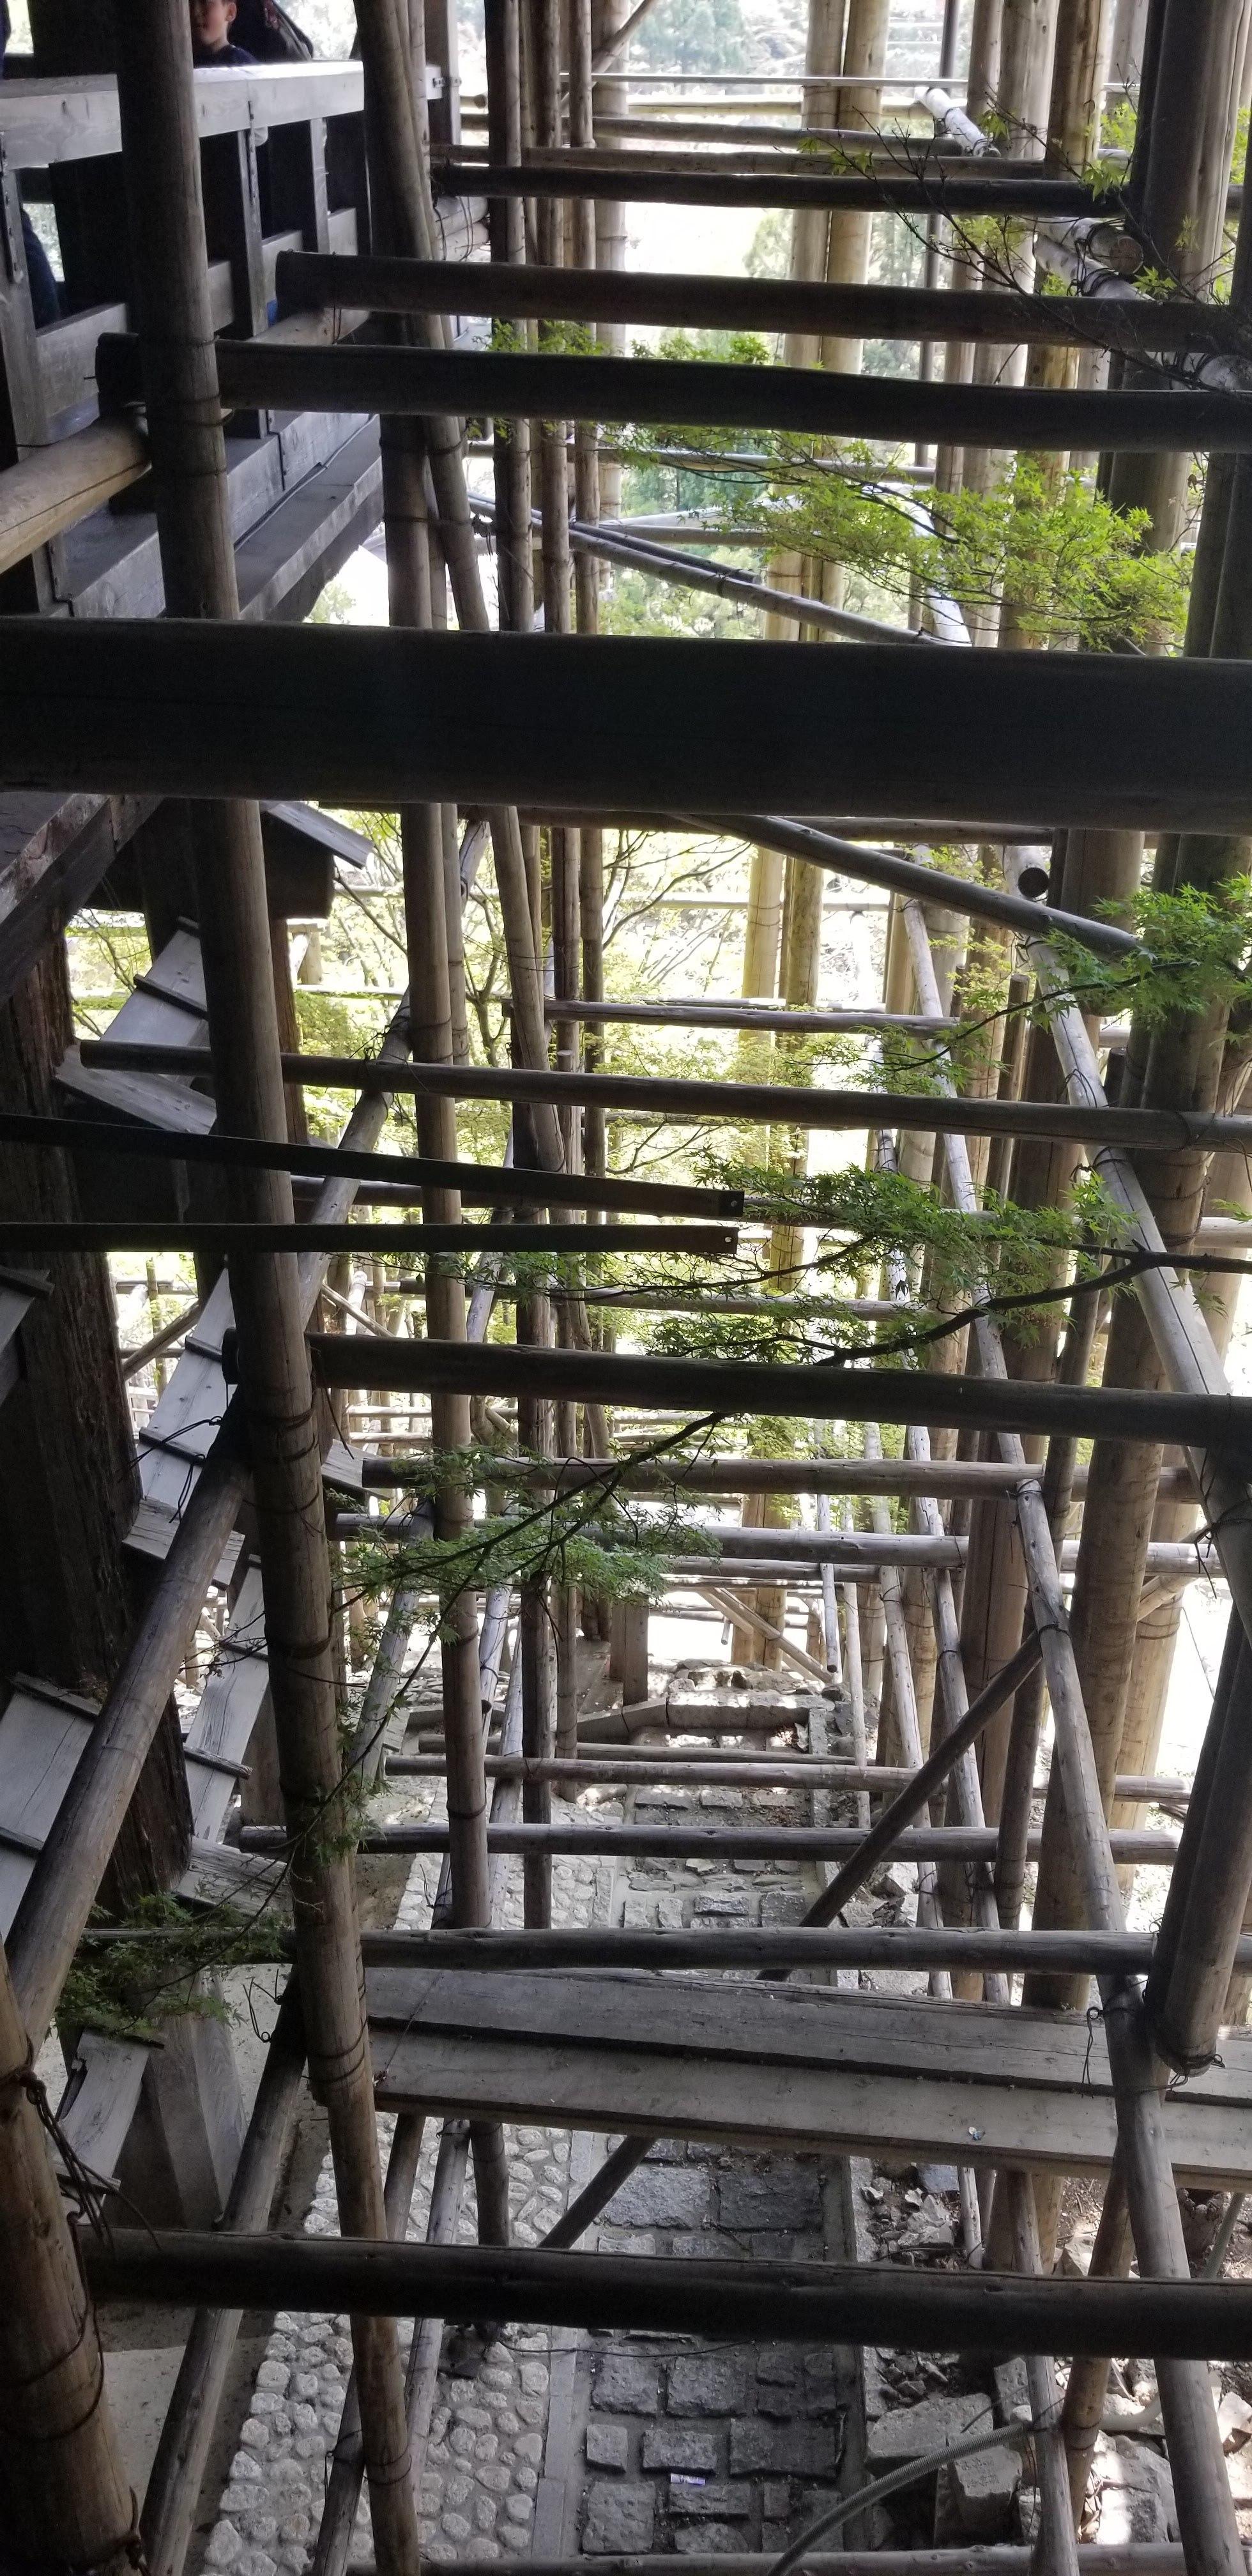 Amazing scaffolding